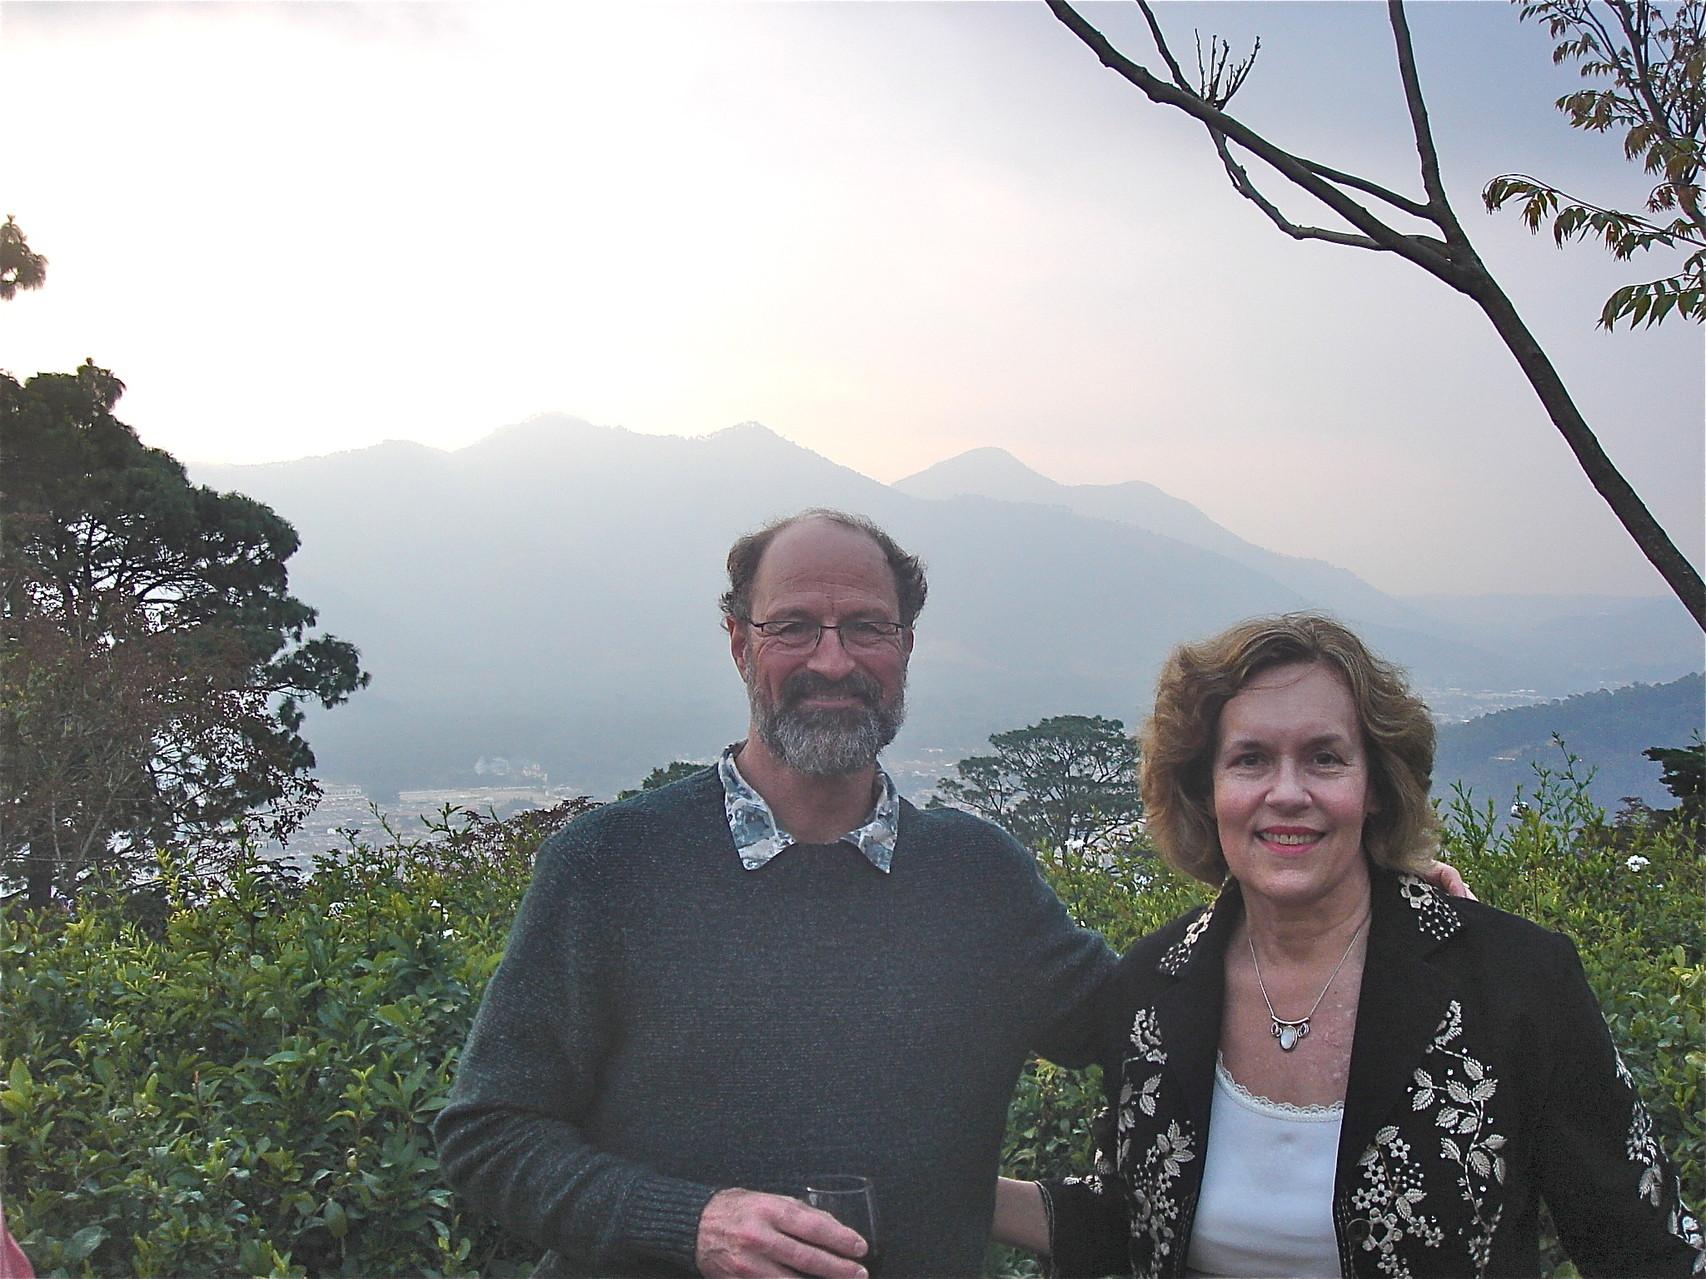 Rich Neubig & Lorraine Gudas, AMSPC Meeting